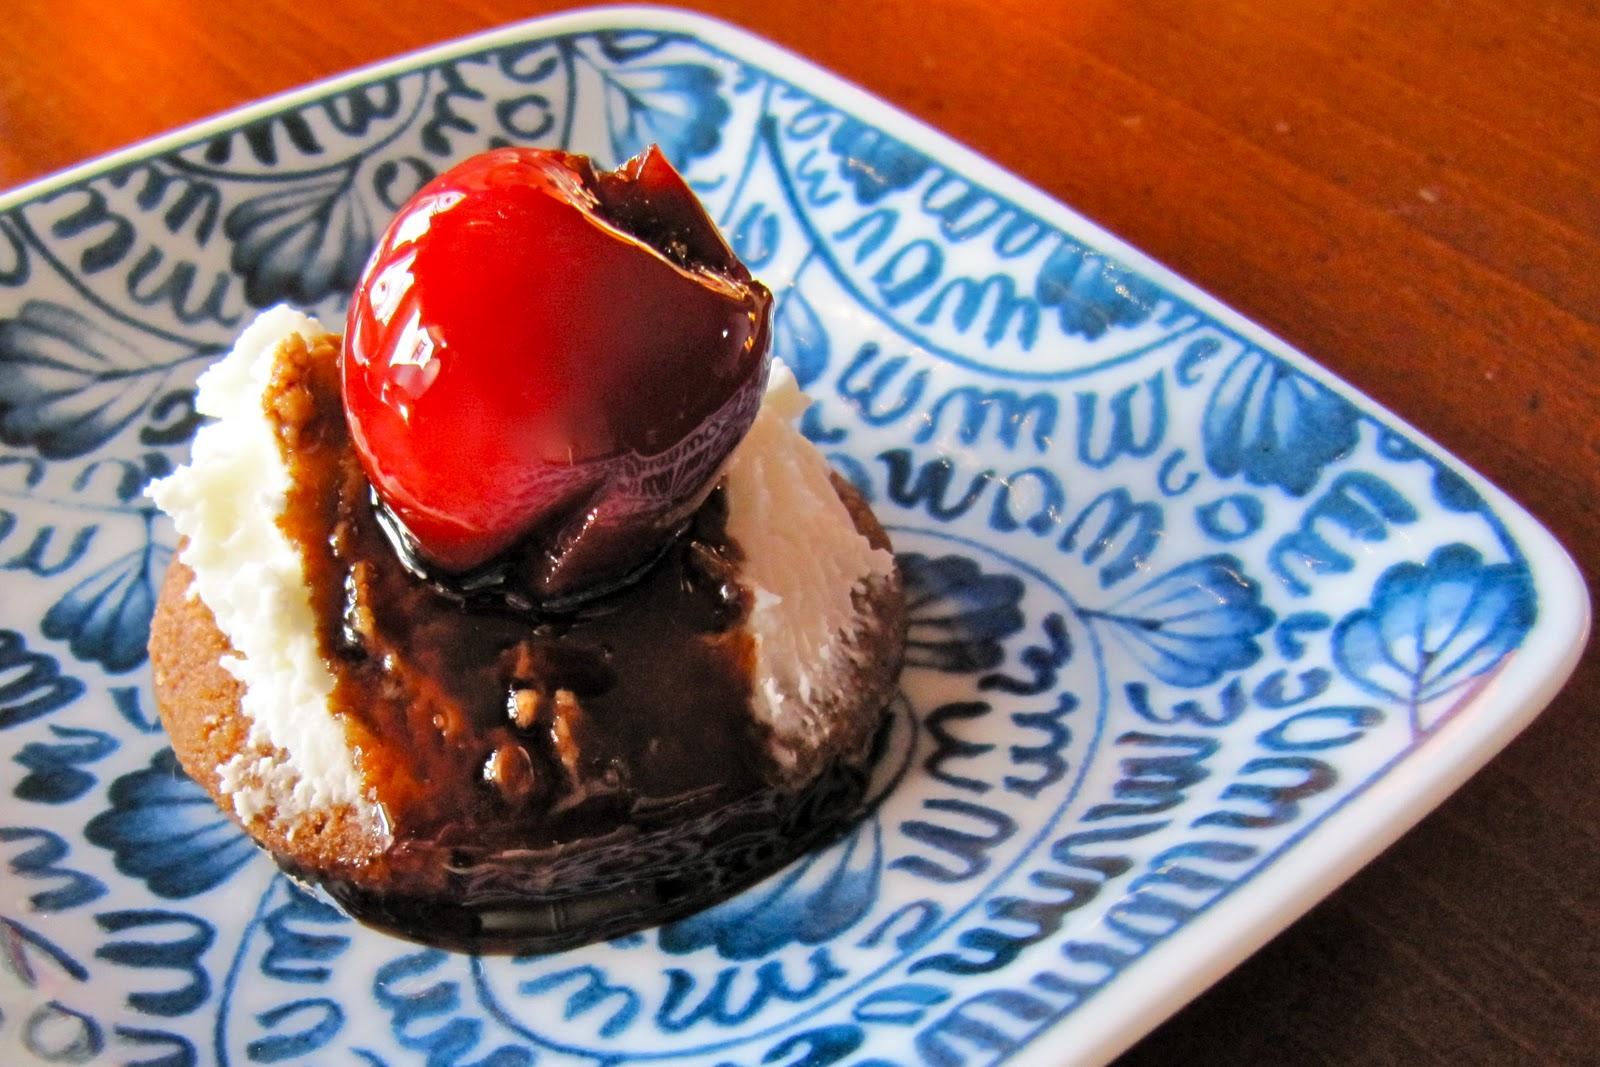 ... Thyme: Honeyed Balsamic Cherry Cheesecake in a Triple Ginger Crust